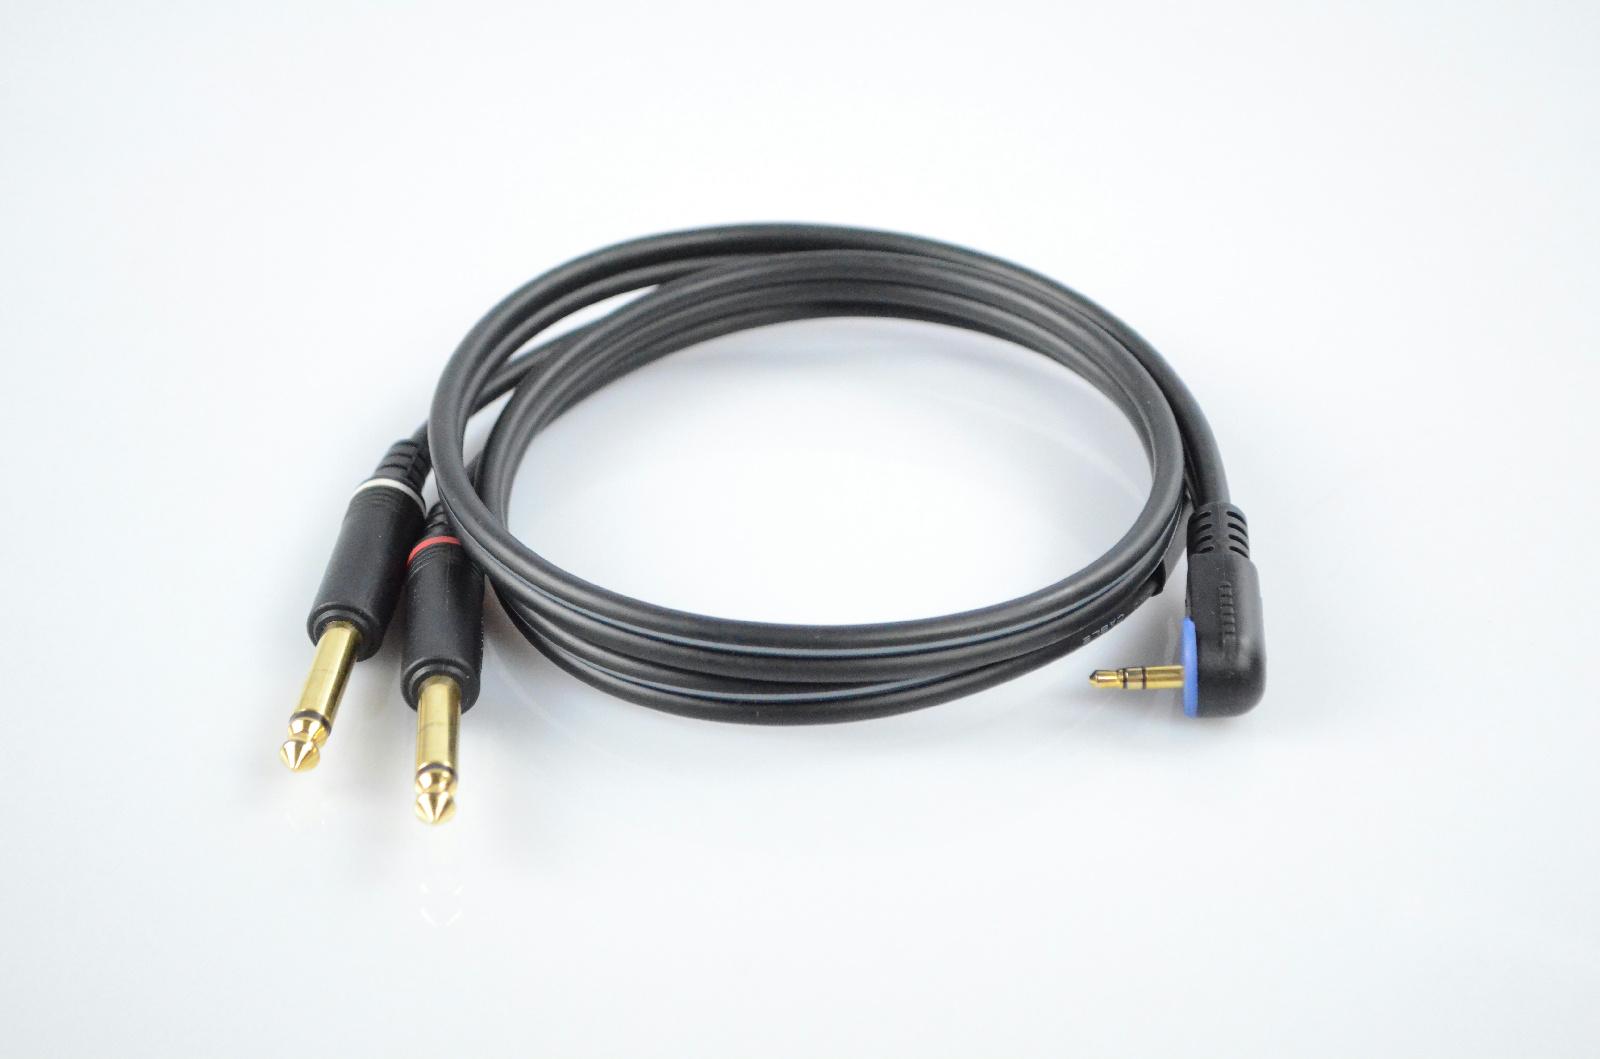 5 Mogami 2 10 Xlr Rca 1 4 Trs Ts 8 Cables Lot 32926 Techno Usb To Wiring